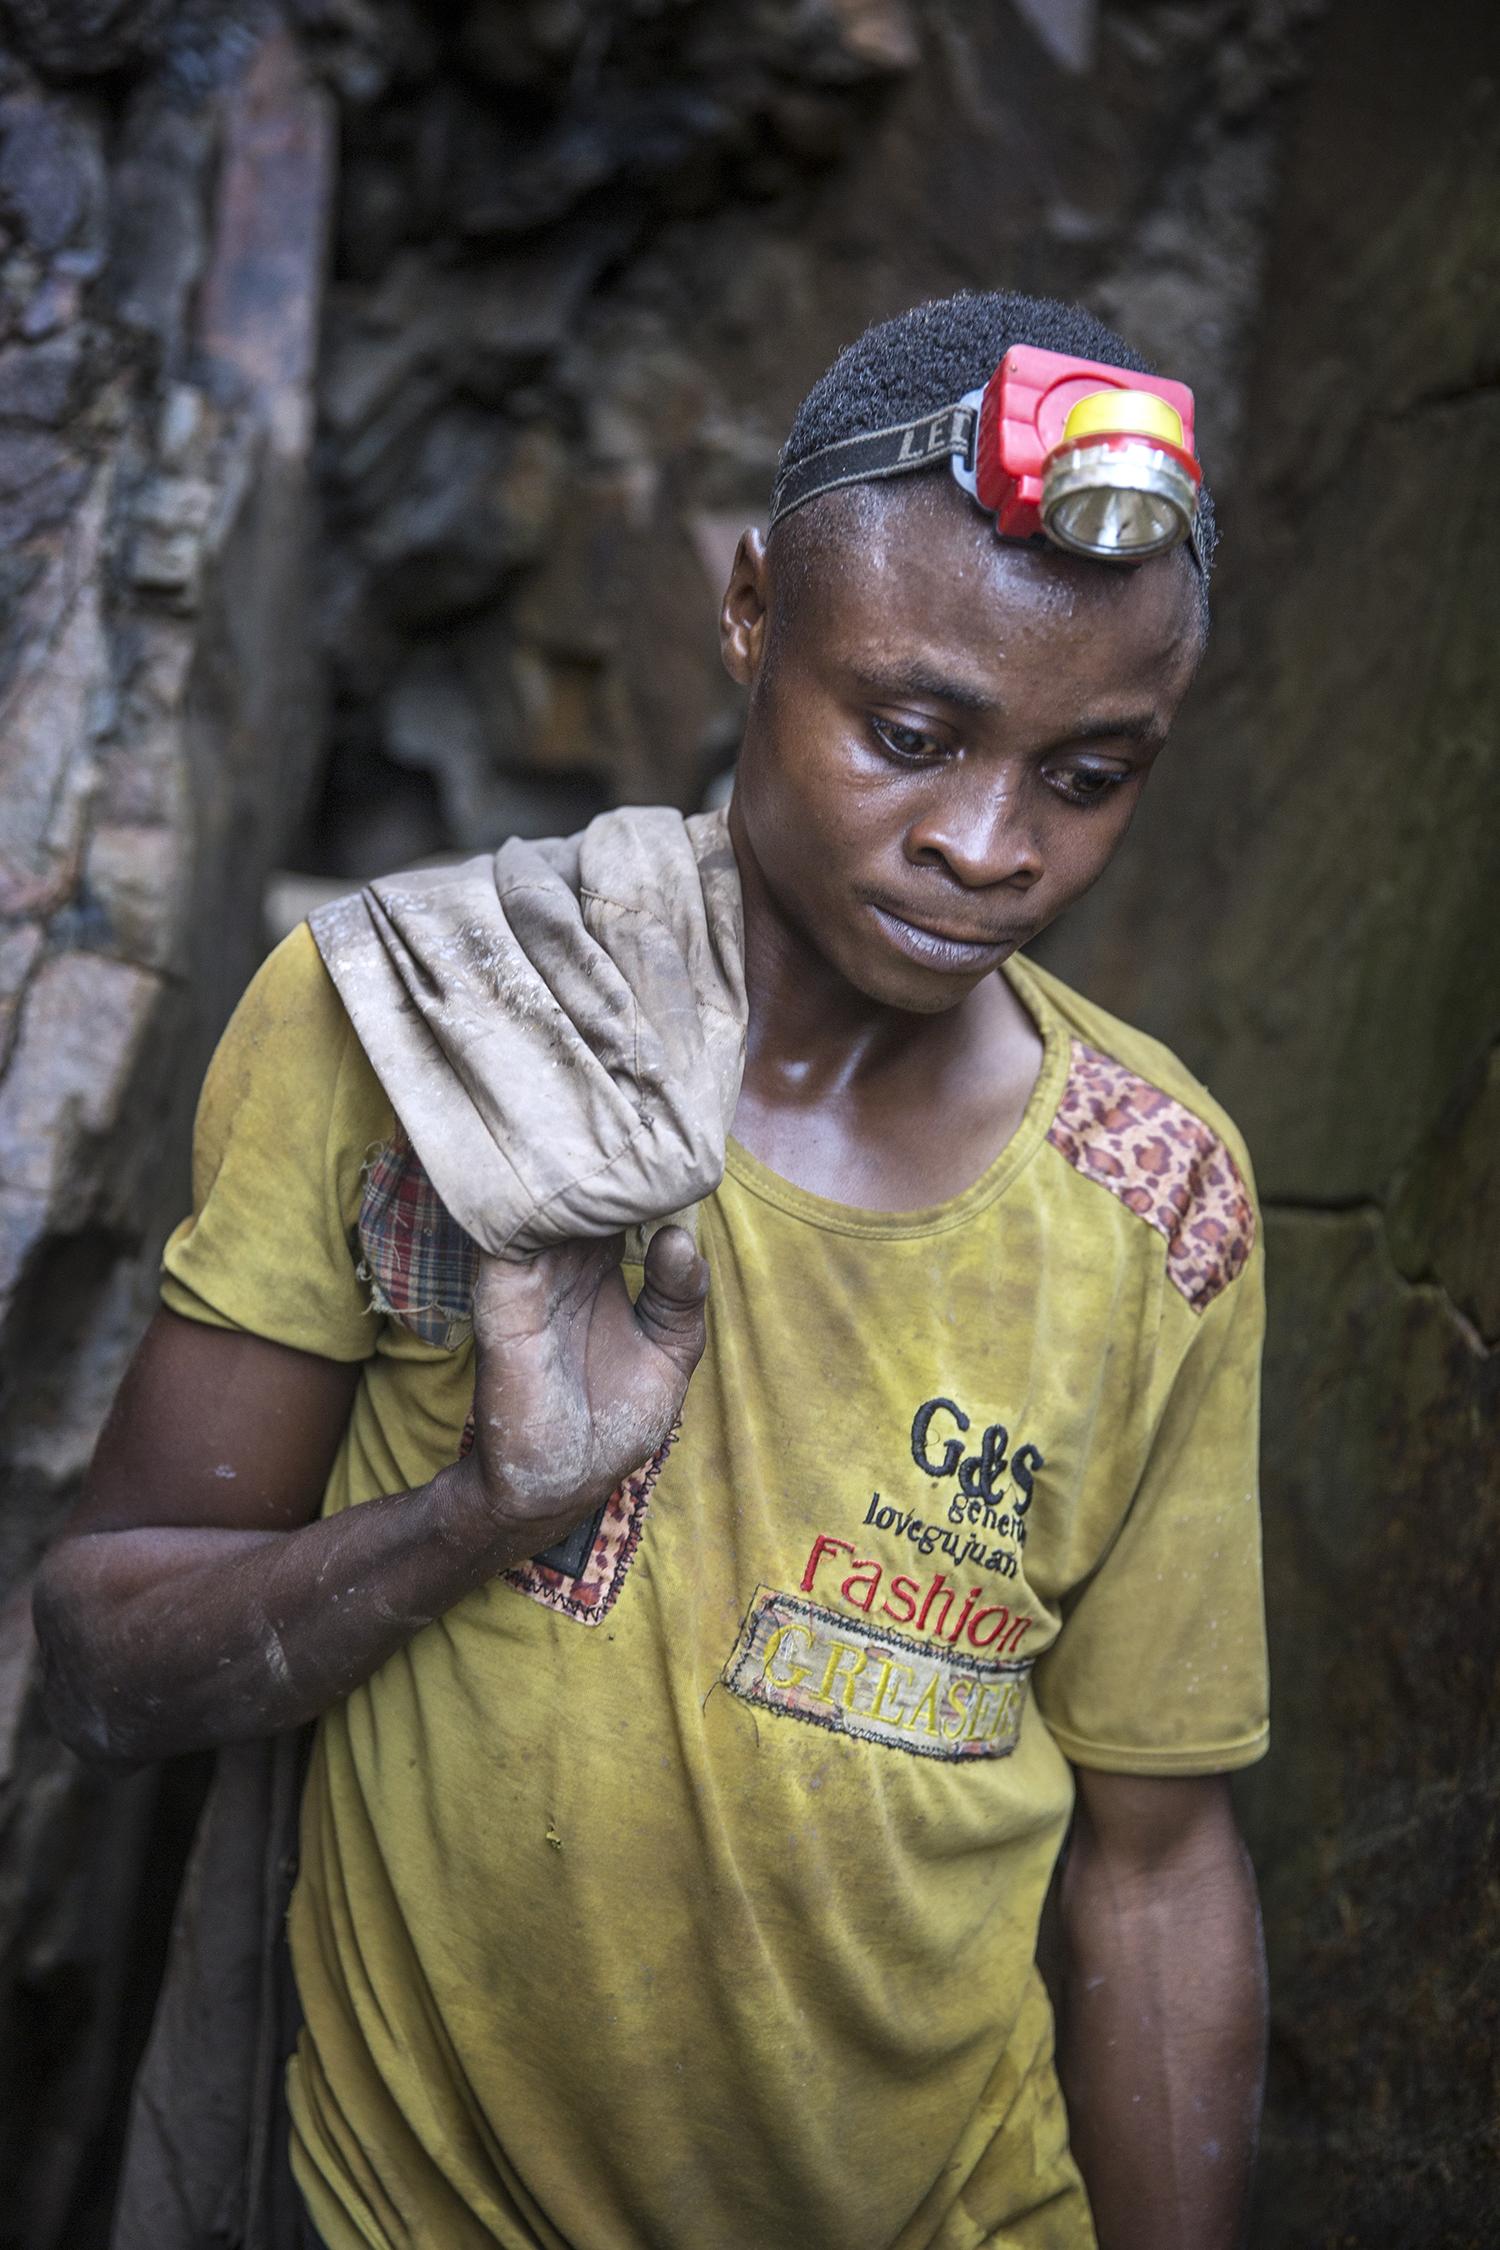 2015_DRC_Congo_conflict_minerals_05.jpg